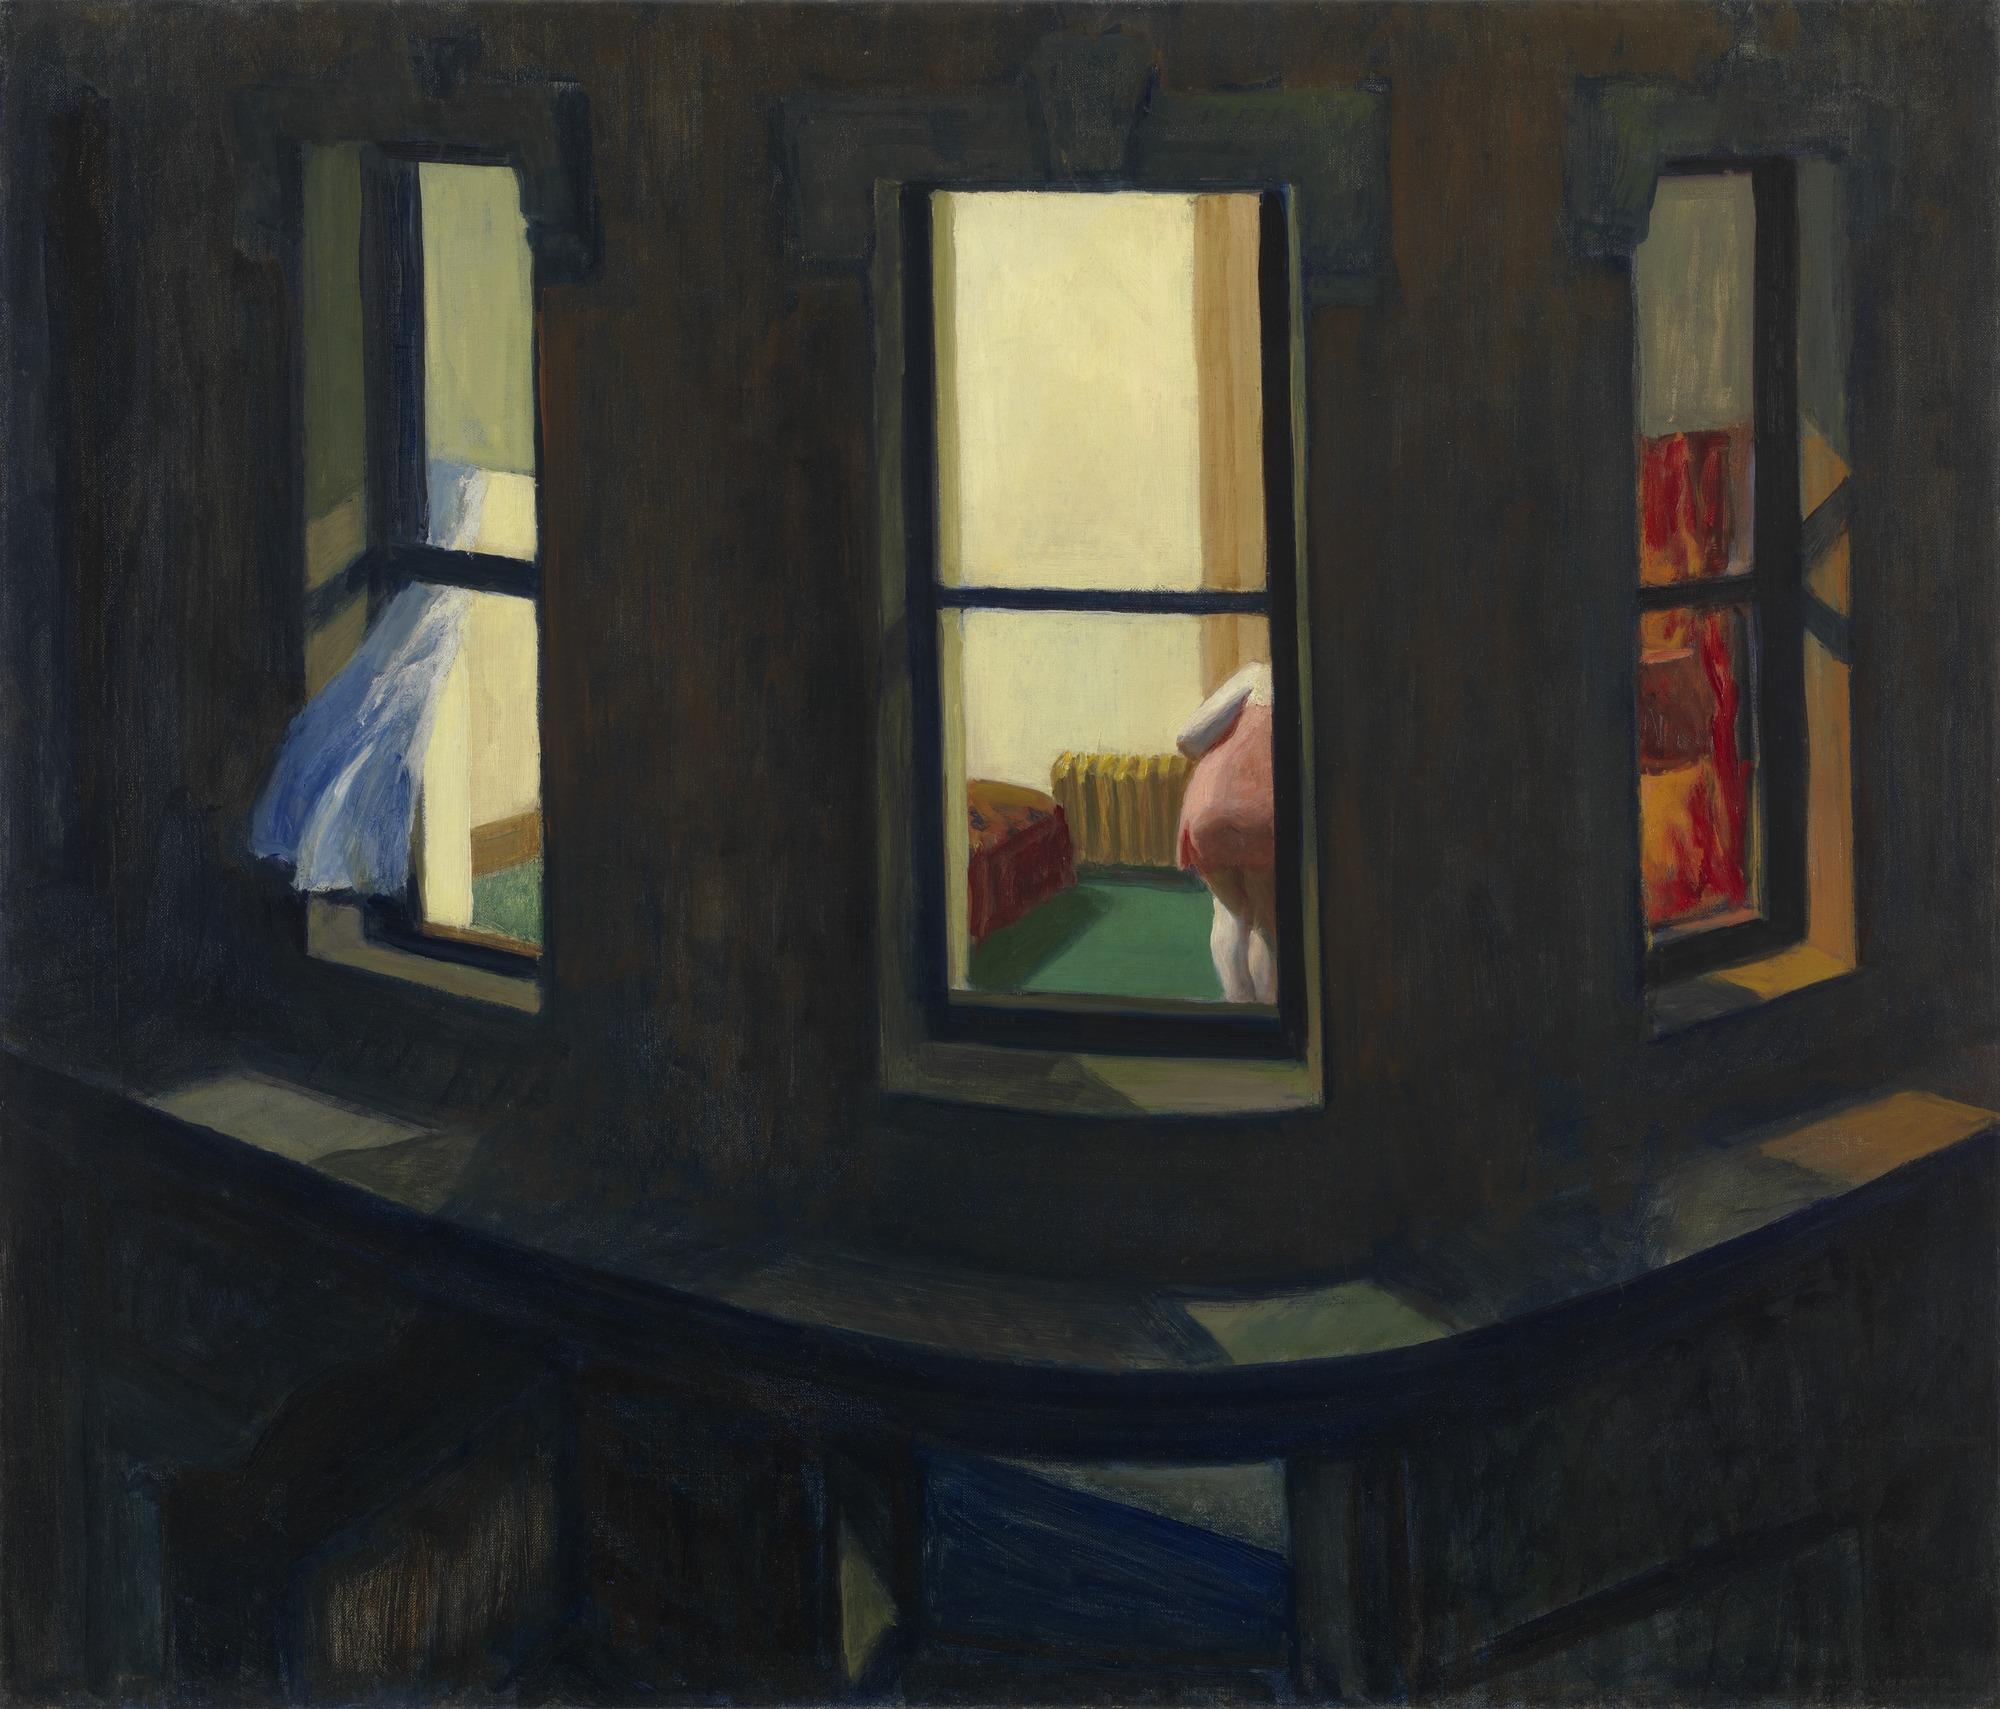 Edward Hopper, Night Windows,1928